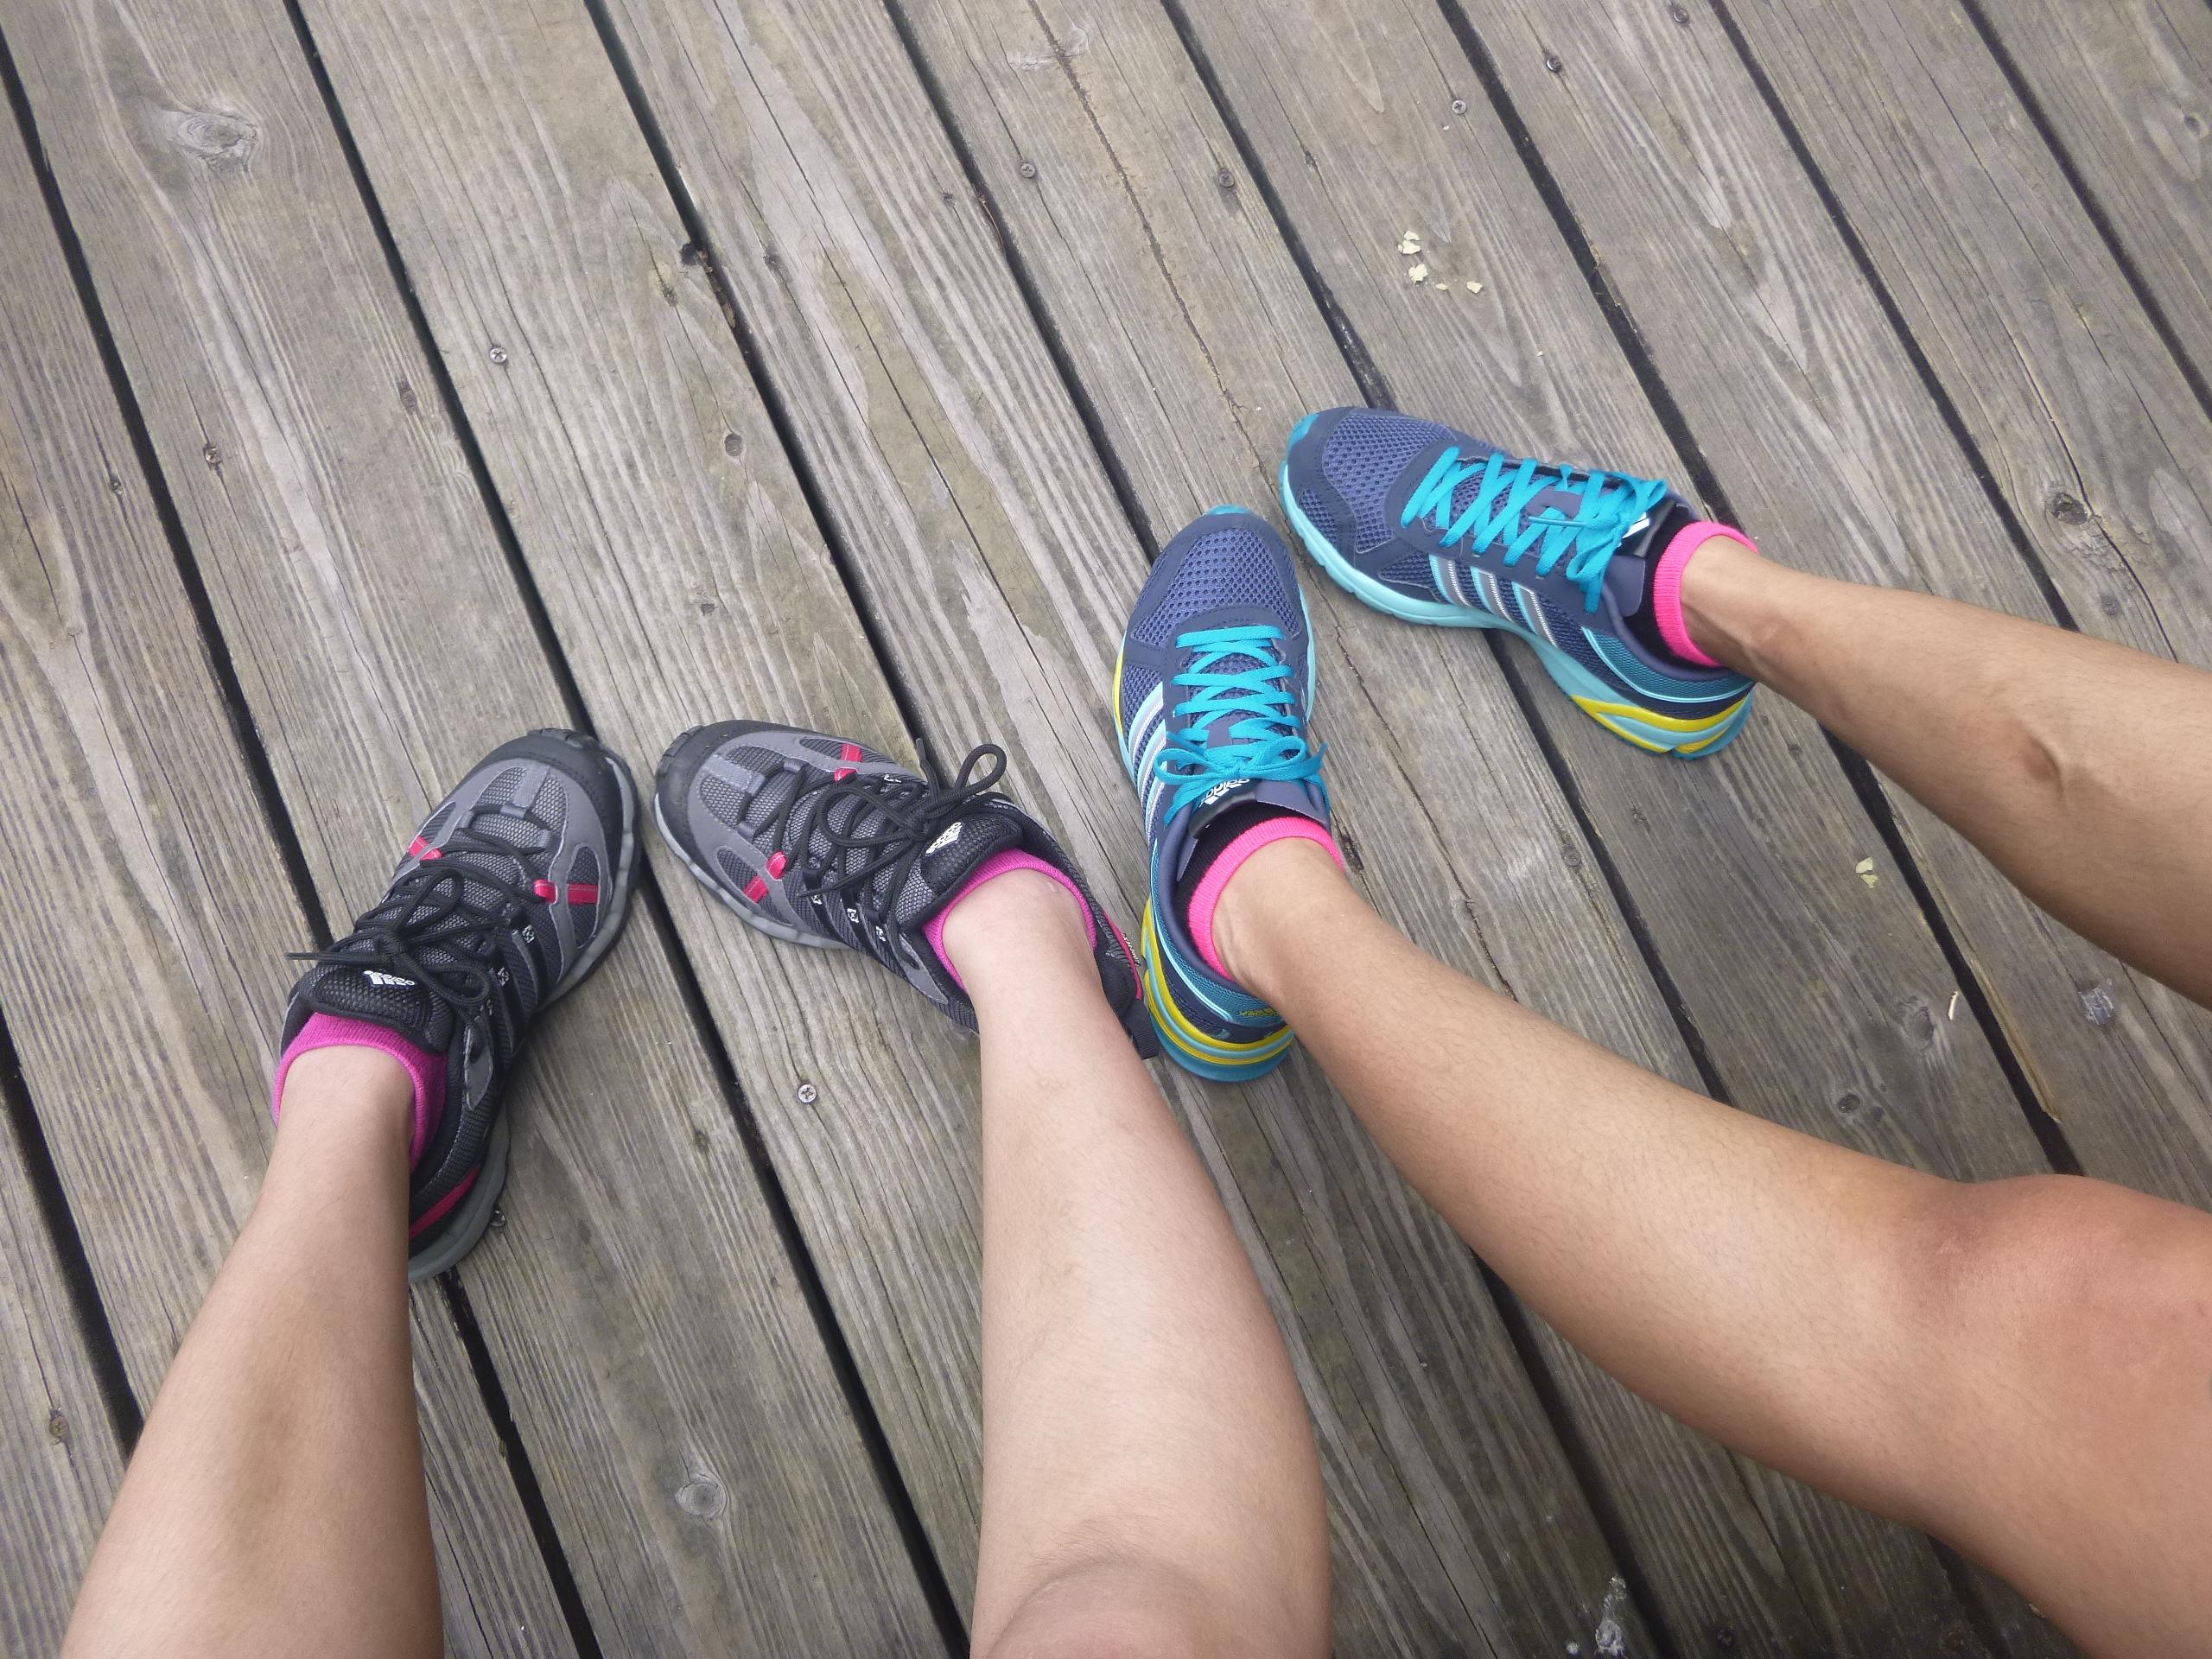 Pink socks!